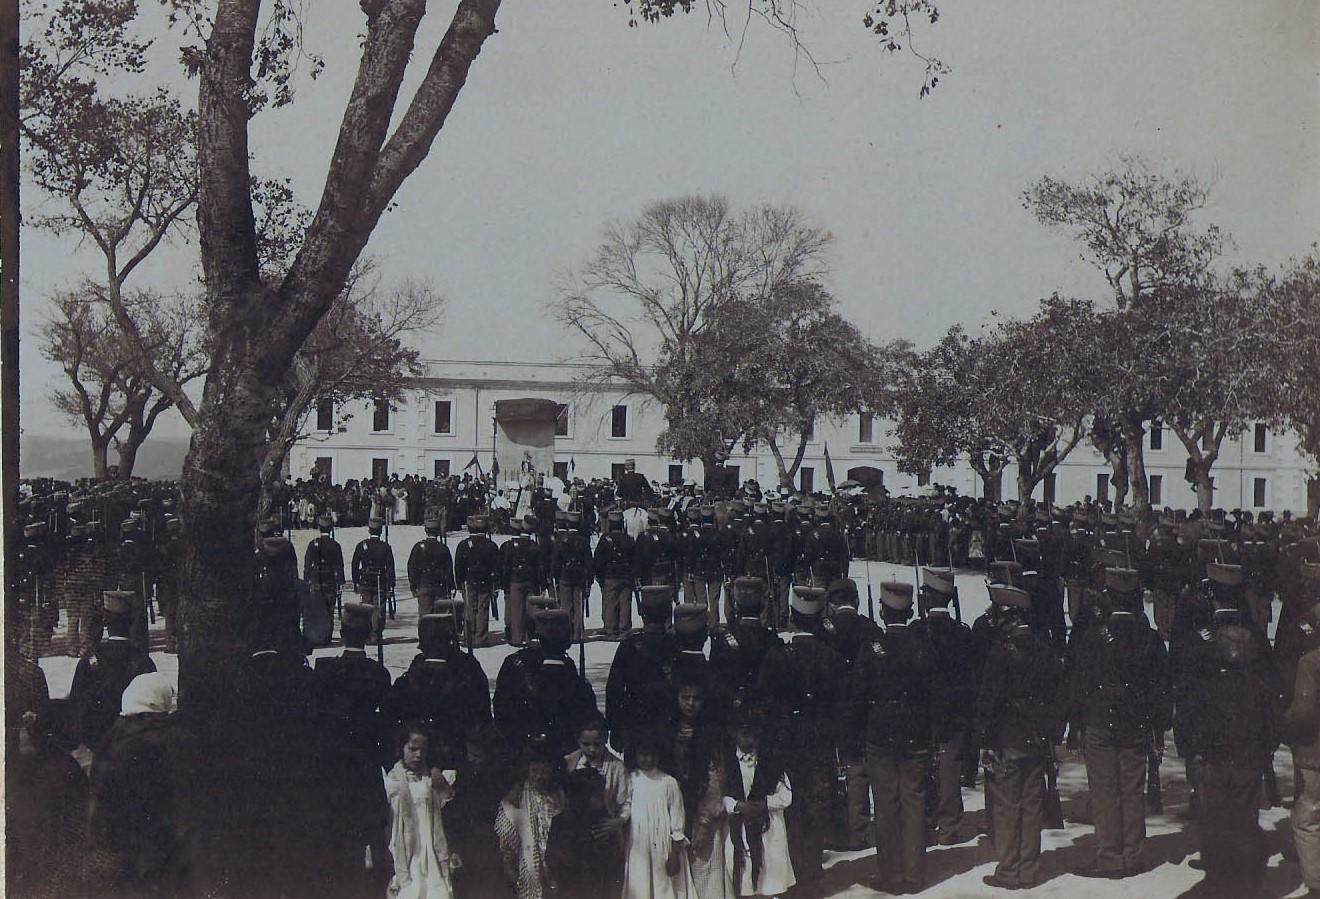 Jura de bandera en la Alameda en 1906. Foto de Pérez Gavira. Archivo Municipal de San Roque